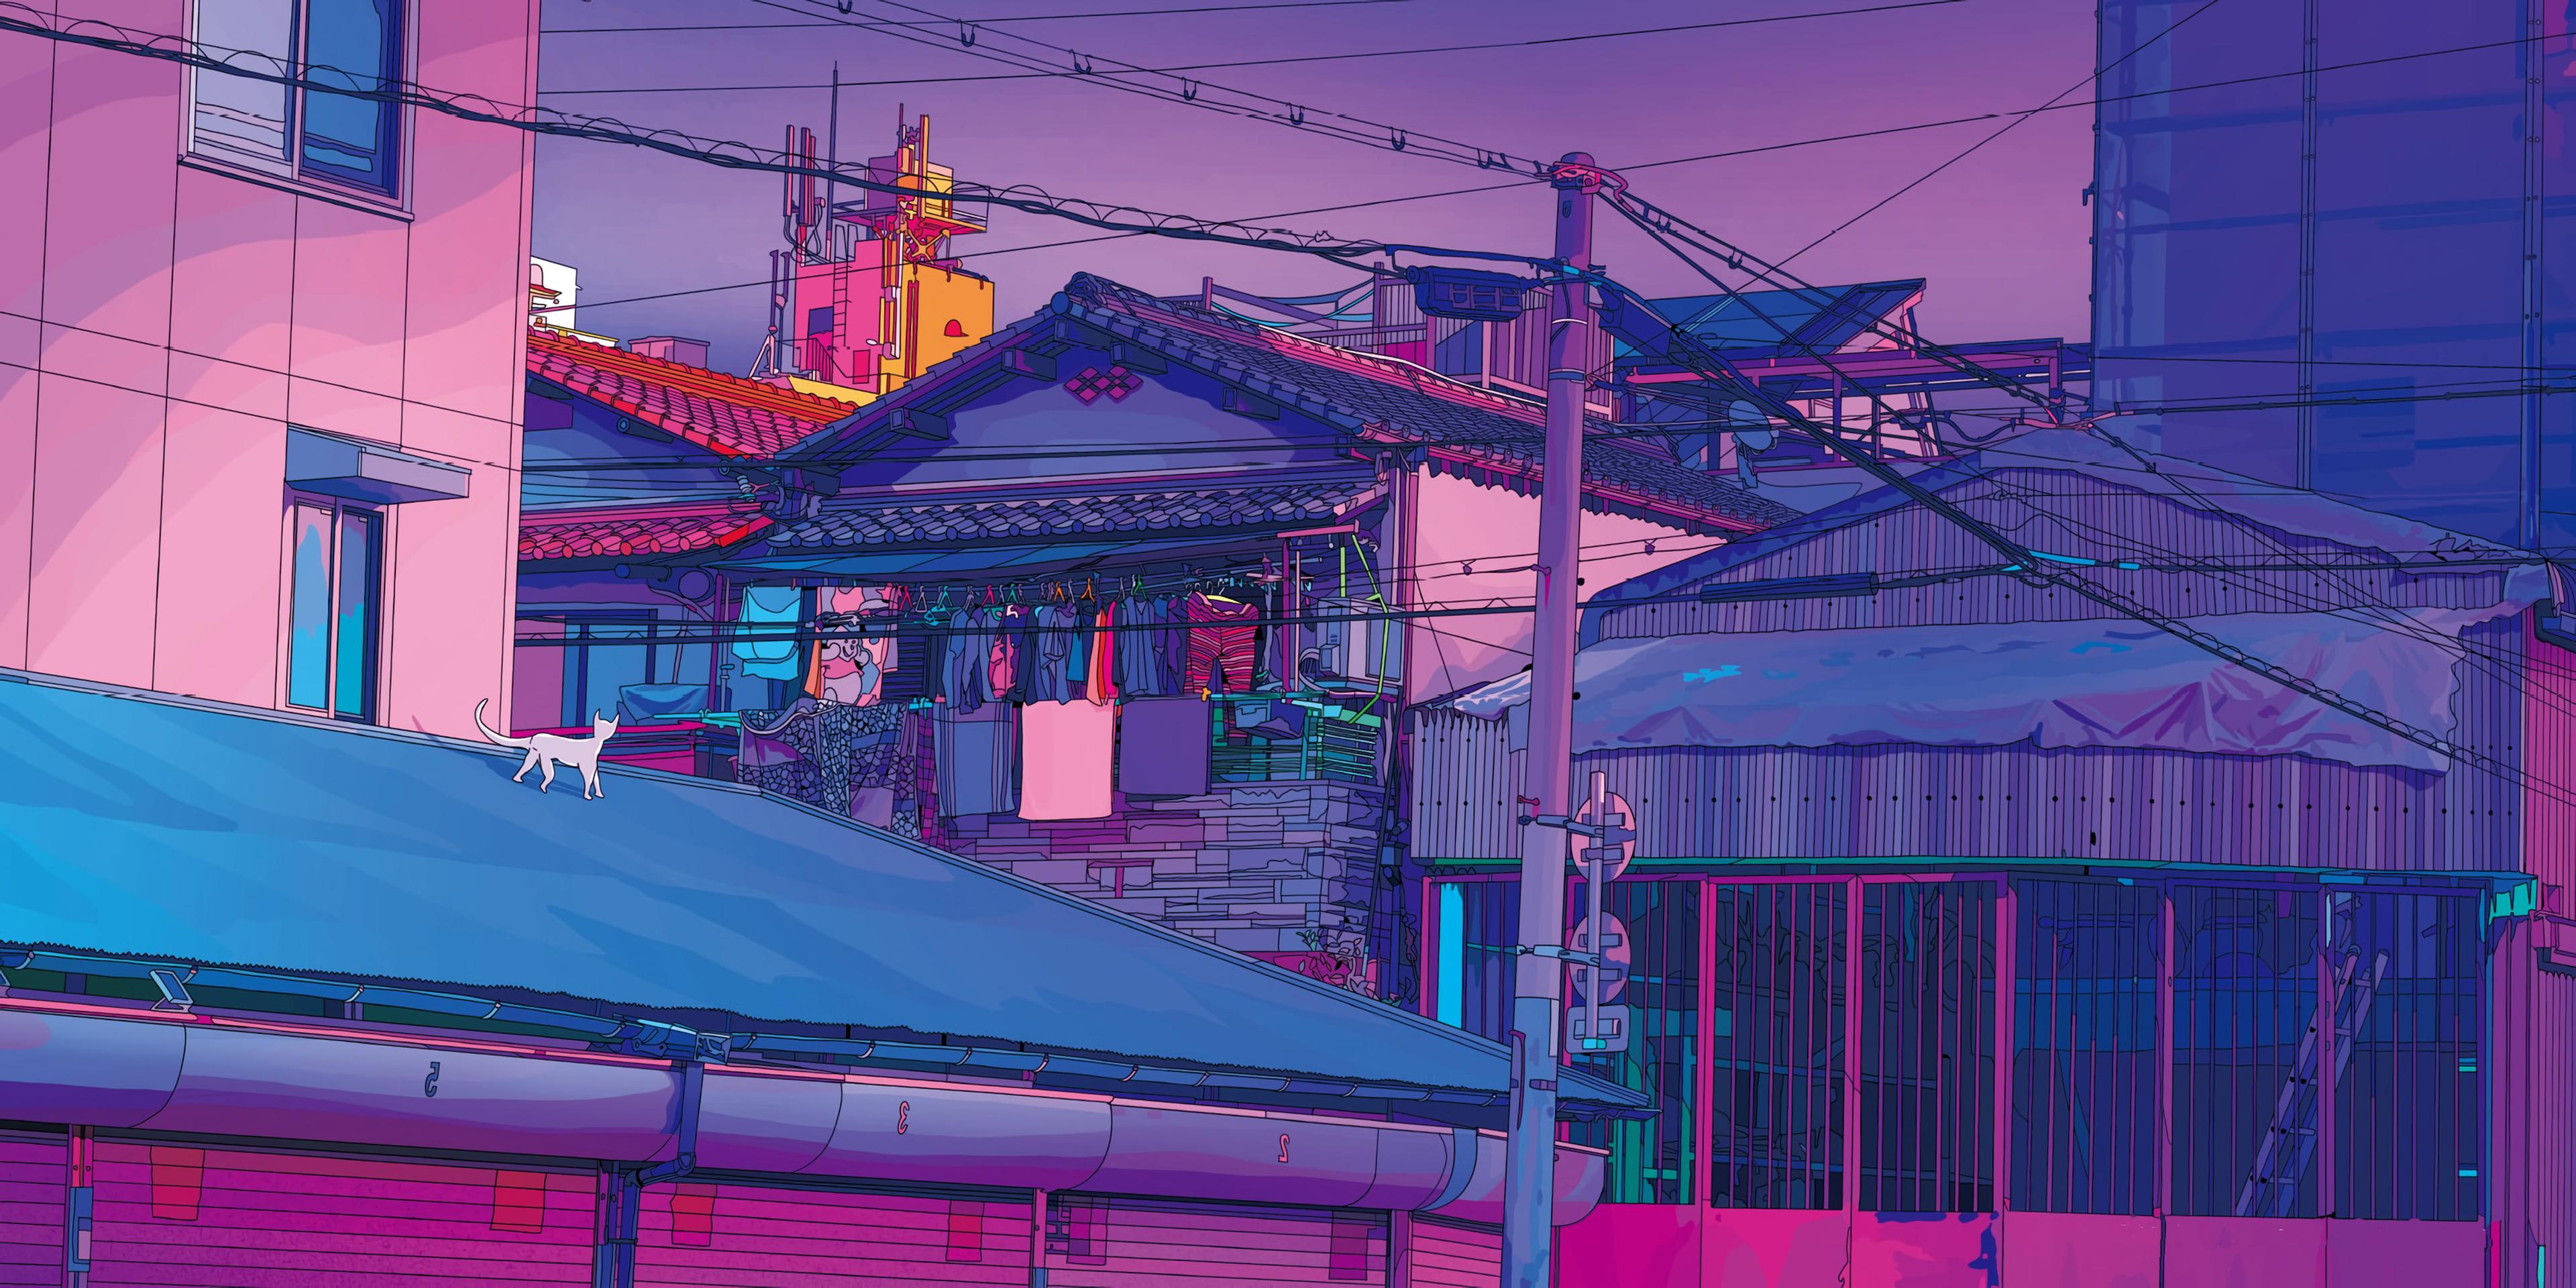 Aesthetic Tokyo Wallpaper Aesthetic Tokyo Wallpaper Desktop 2968592 Hd Wallpaper Backgrounds Download